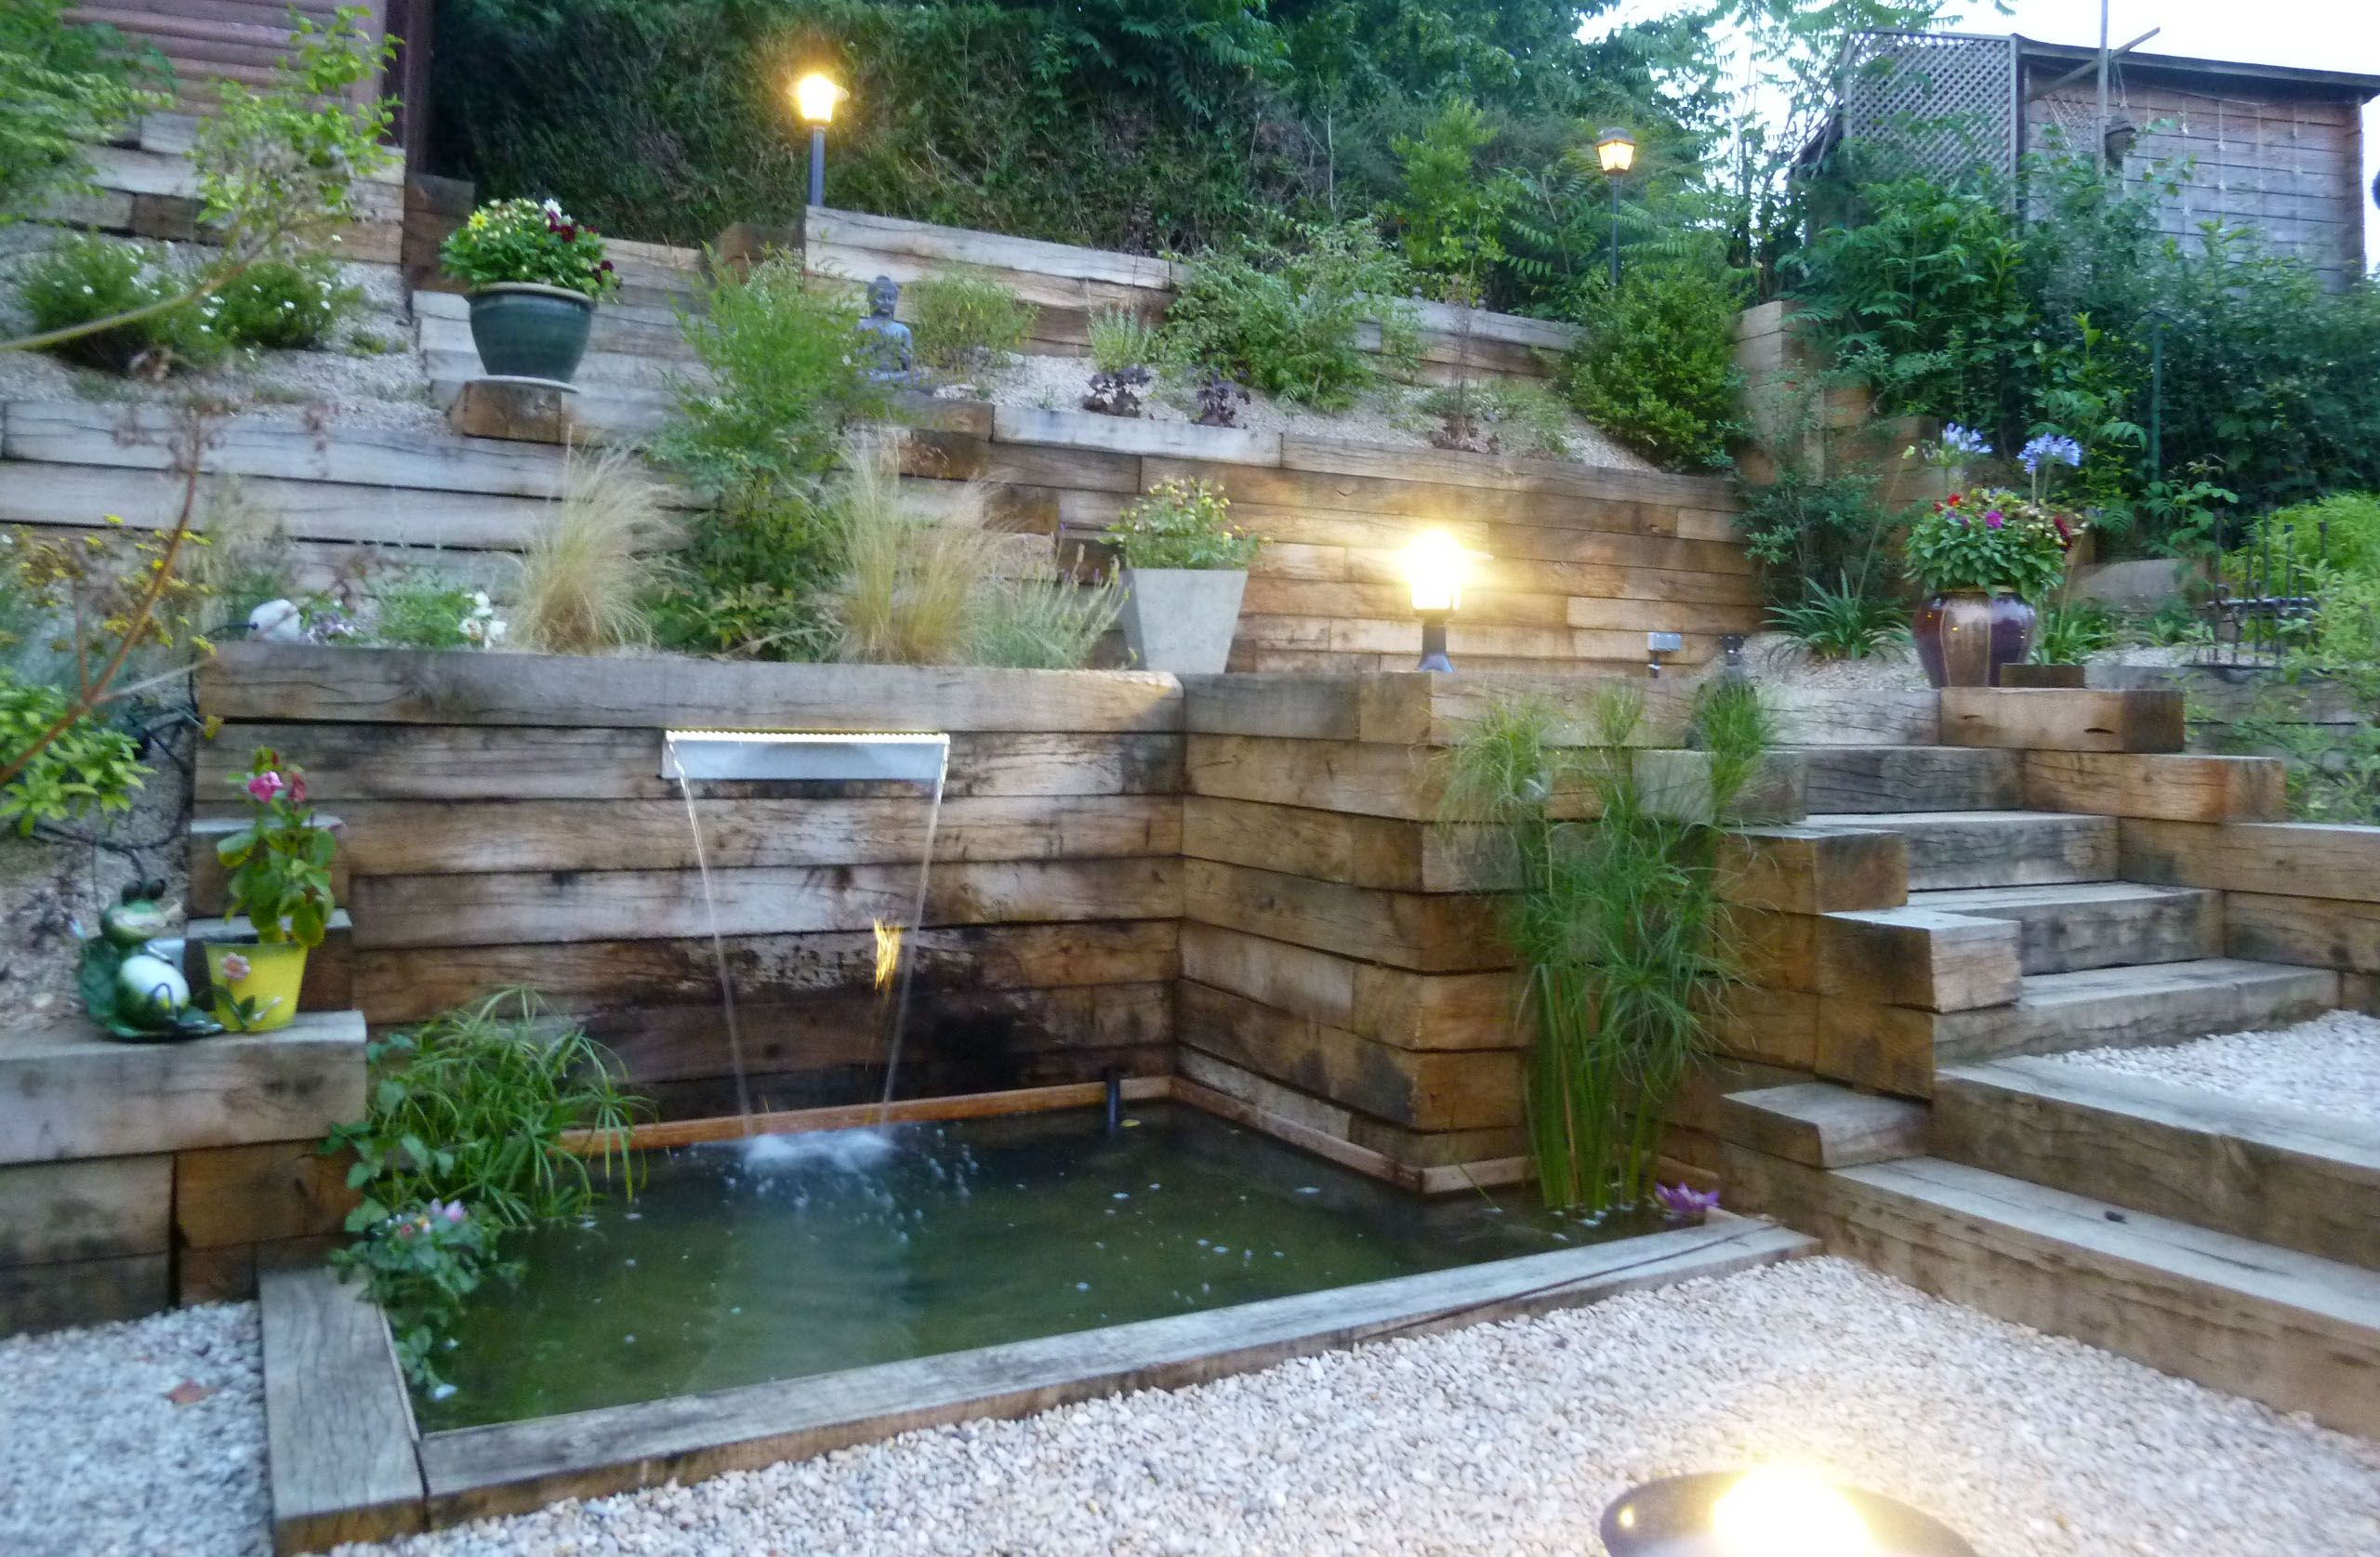 Jardin En Pente - Recherche Google | Amenagement Jardin En ... avec Amanagement Jardin En Pente